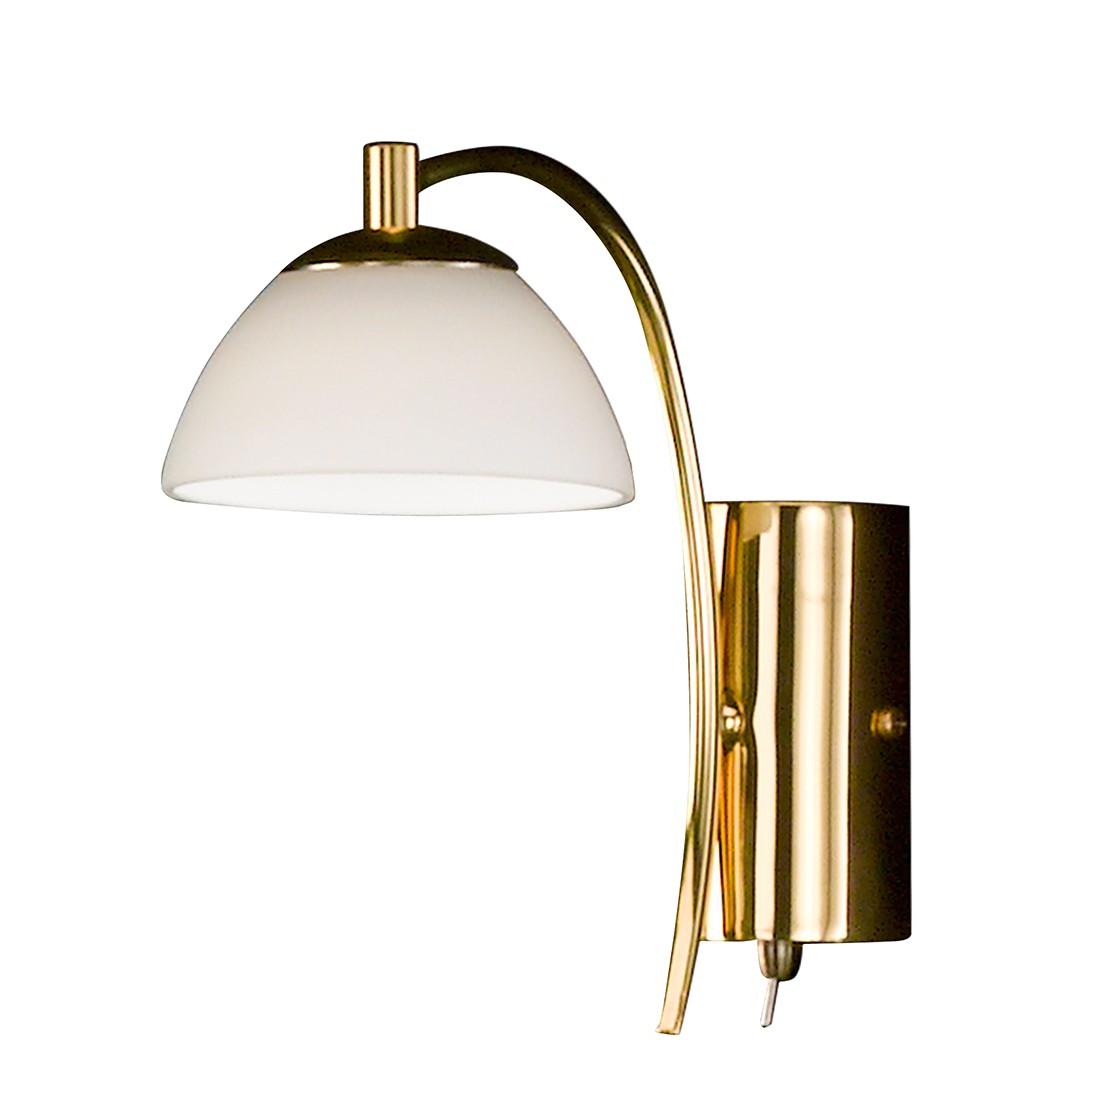 preisvergleich eu wandleuchten led gold. Black Bedroom Furniture Sets. Home Design Ideas